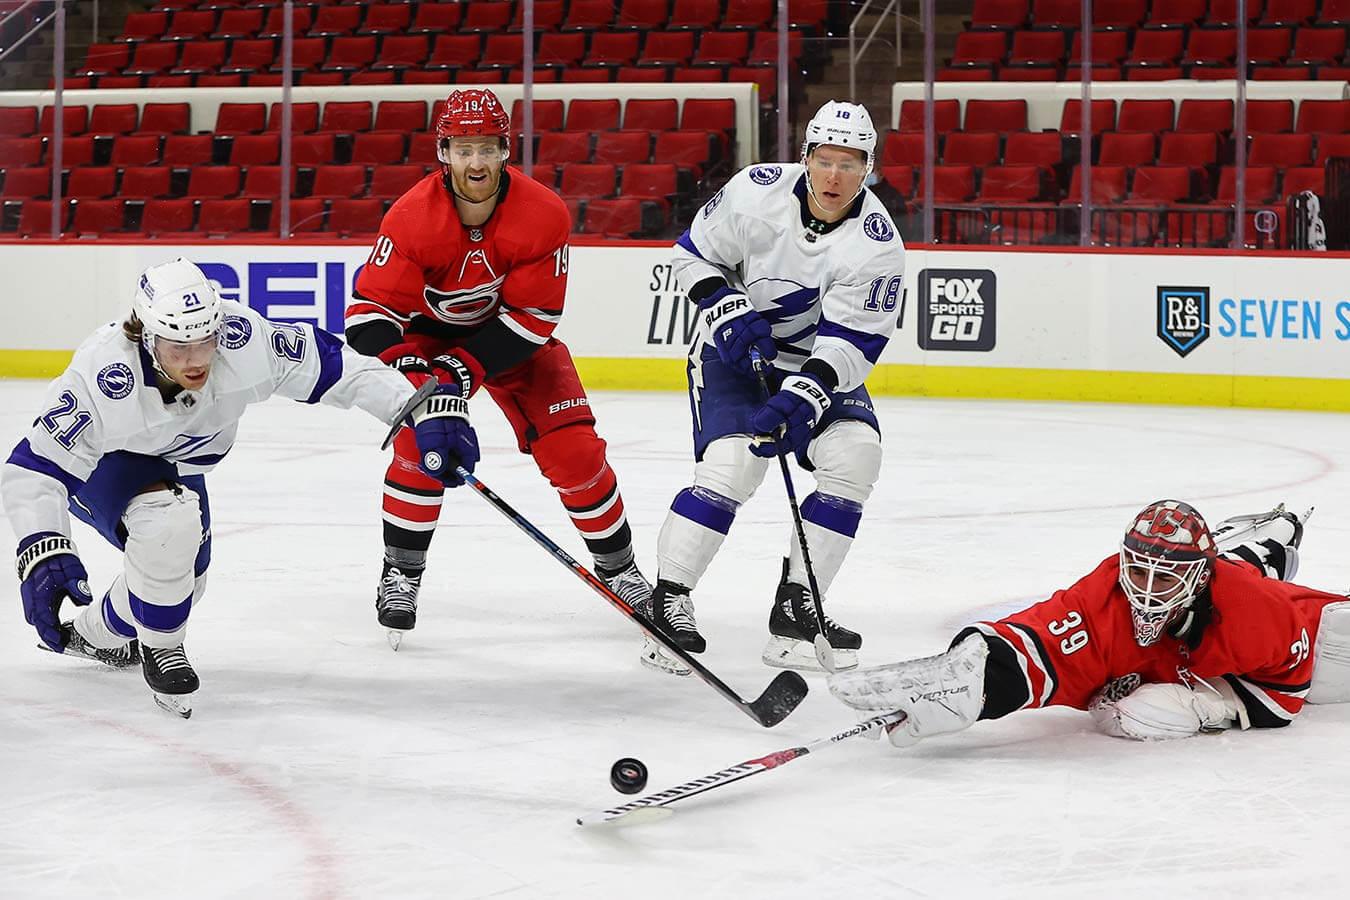 Каролина — Тампа-Бэй. Прогноз на матч. 09.06.2021. НХЛ. Плей-офф